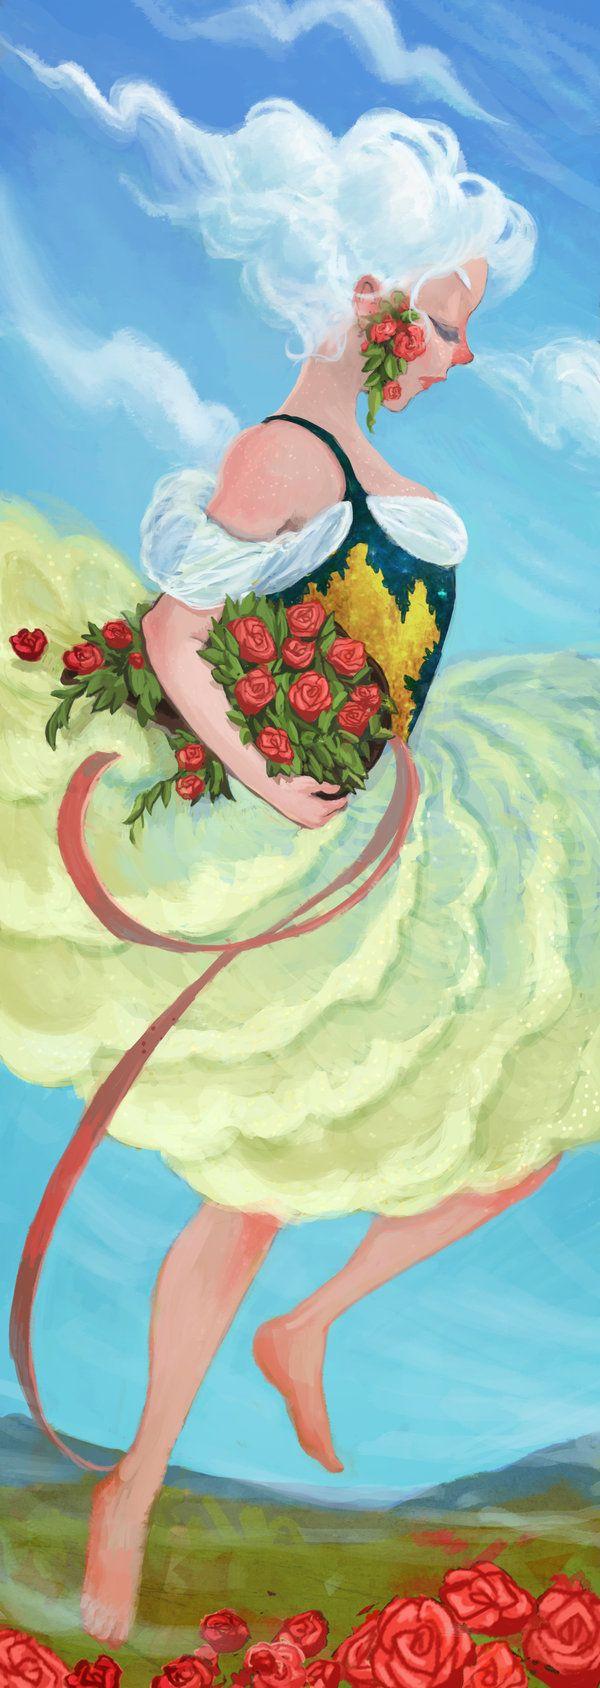 Giantess Tinkerbell inside 46 best marta nael ( martanael ) images on pinterest